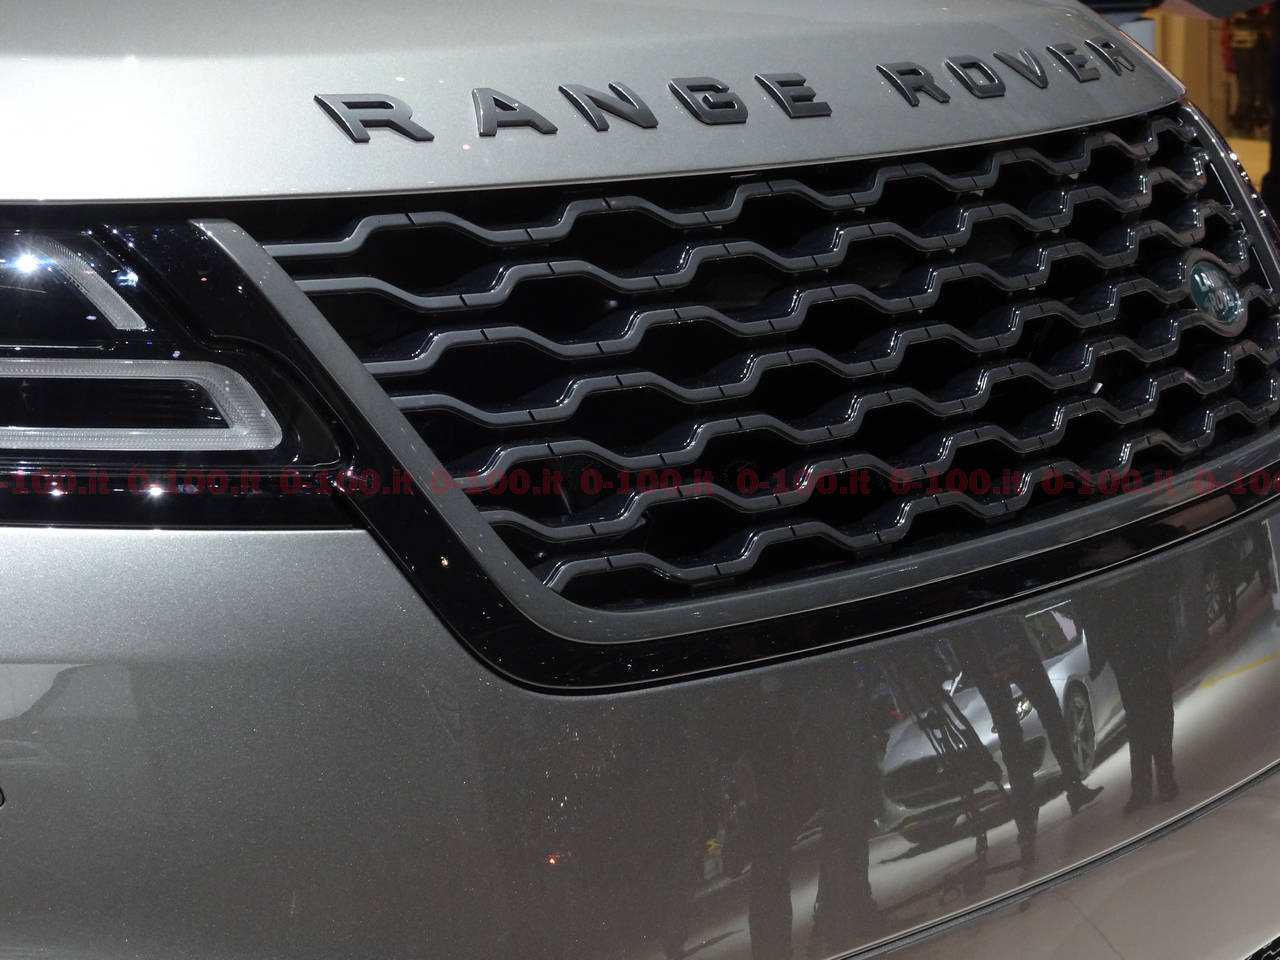 geneva-geneve-ginevra-2017-auto-show-range-rover-velar-0-100_33